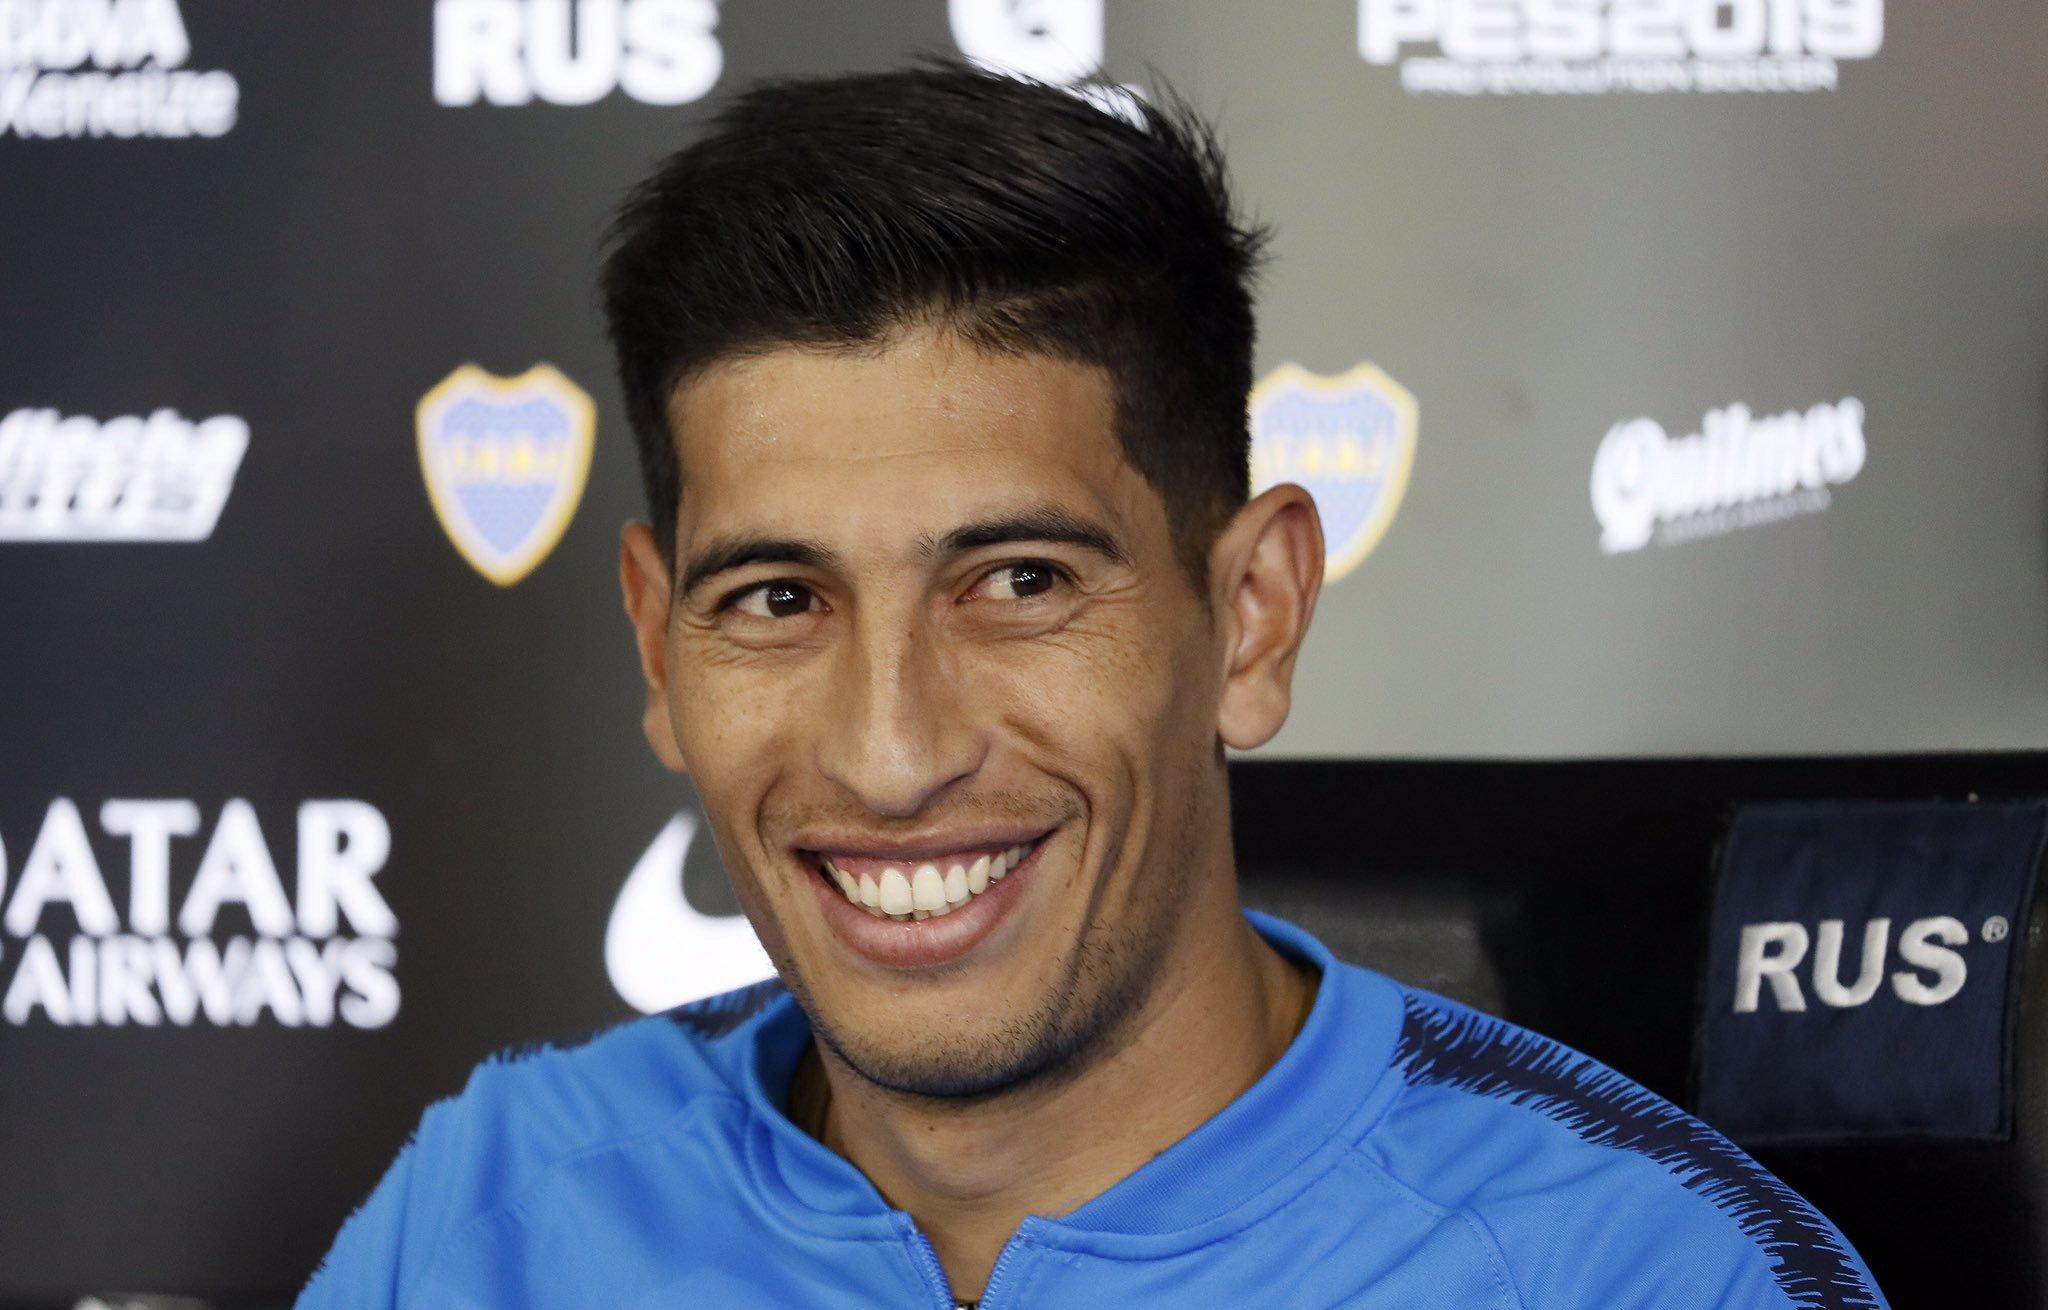 boca juniors-carlos tevez-esteban andrada-copa america-lionel scaloni-seleccion argentina-conferencia de prensa